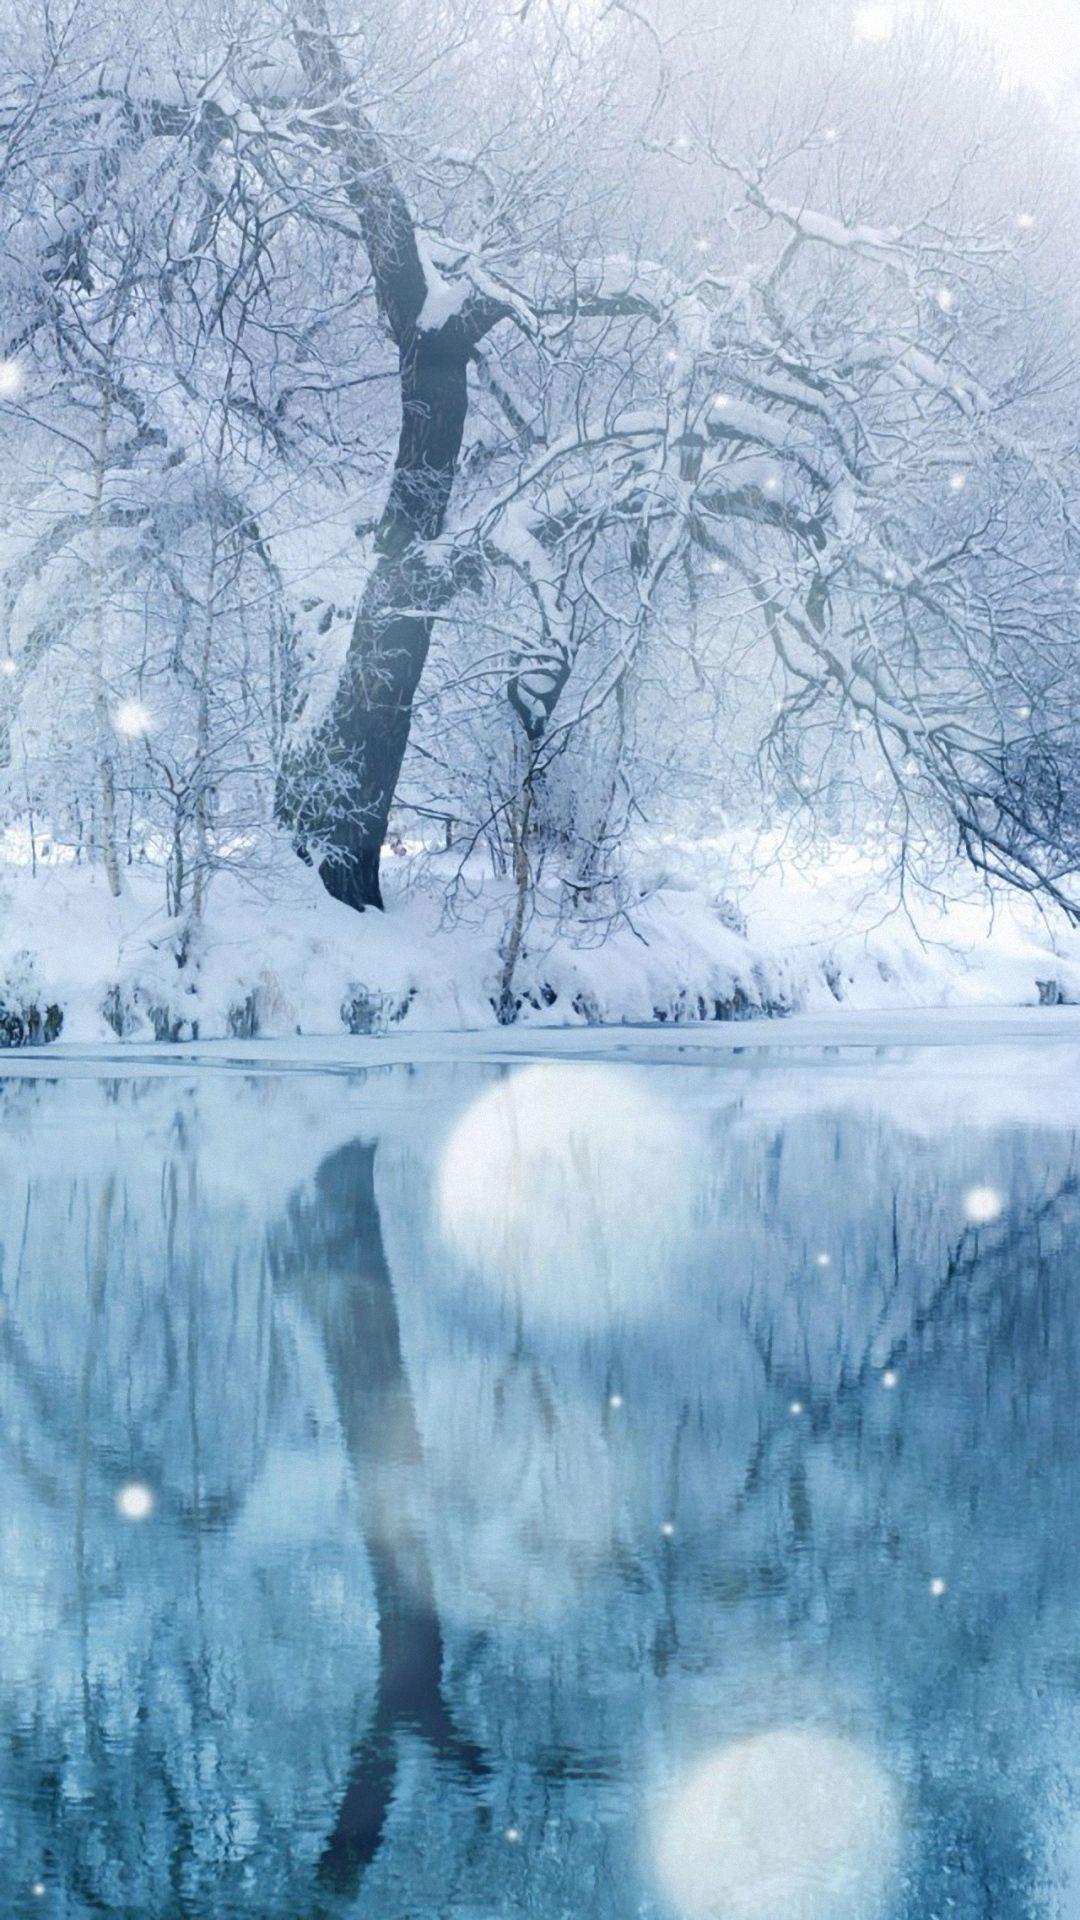 Free Winter Wallpaper Winter Wonderland Wallpaper Iphone Wallpaper Winter Winter Wallpaper